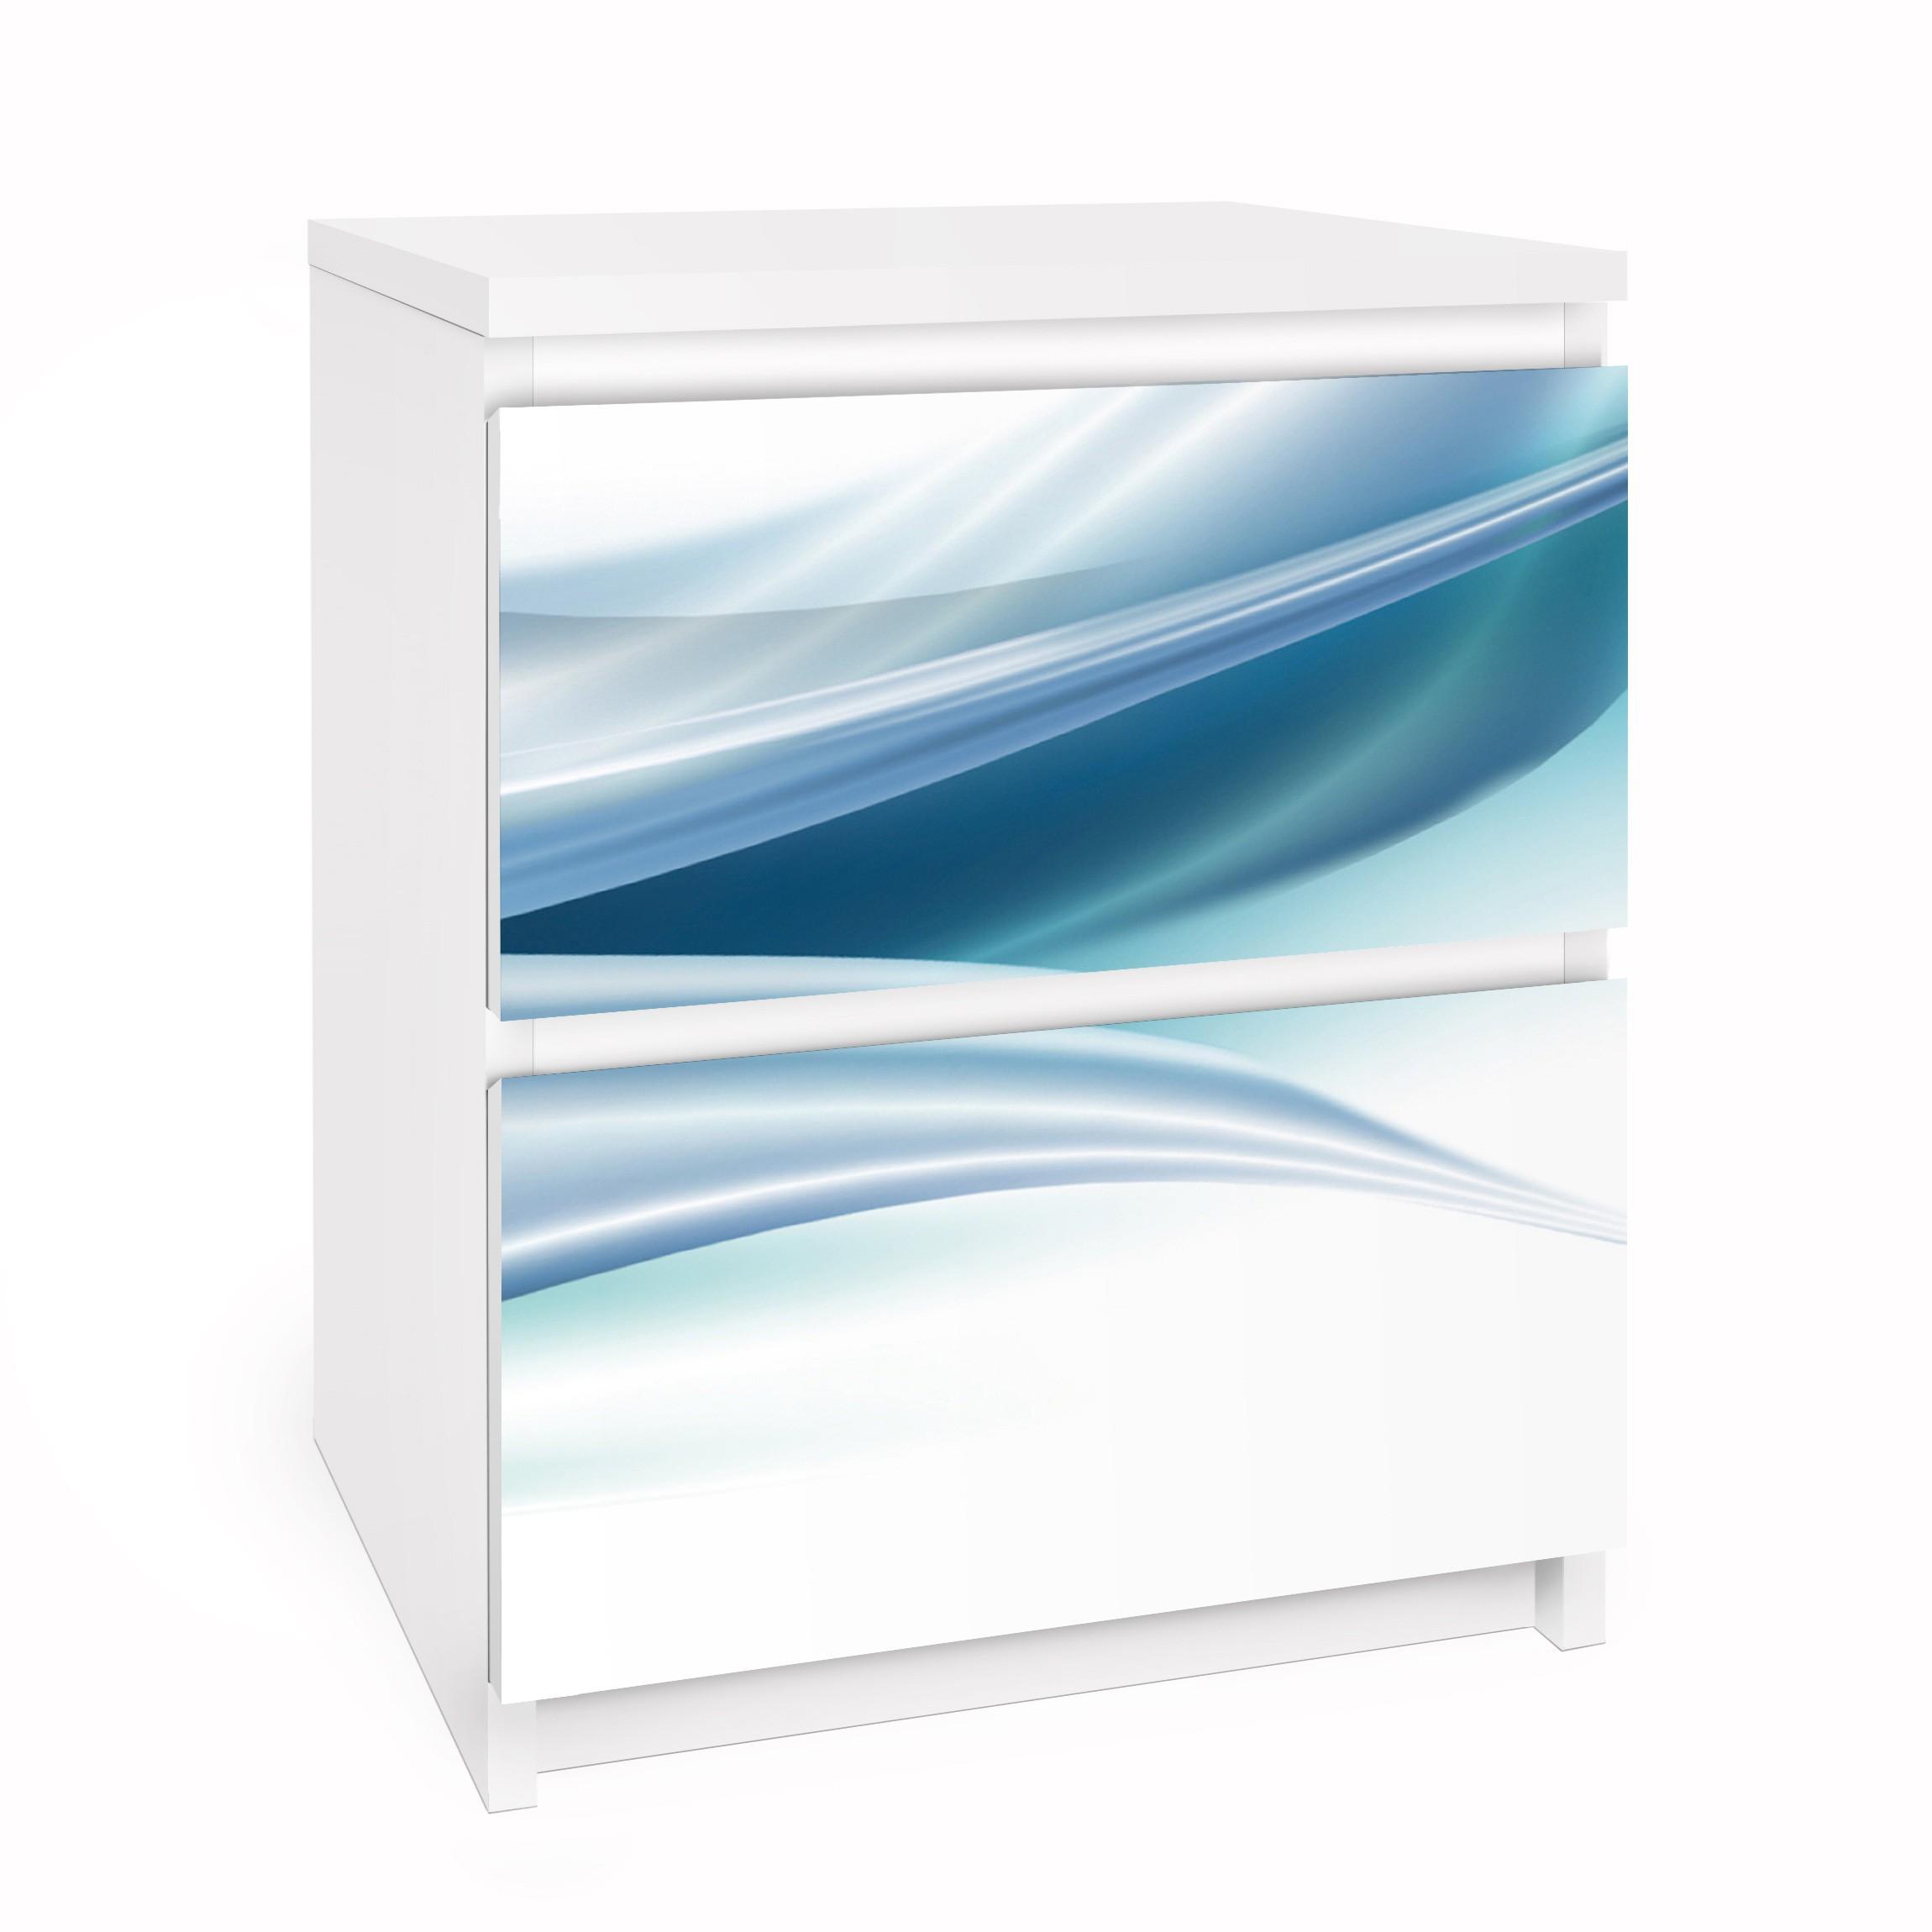 Carta adesiva per mobili ikea malm cassettiera 2xcassetti blue dust - Pellicola adesiva per mobili ikea ...